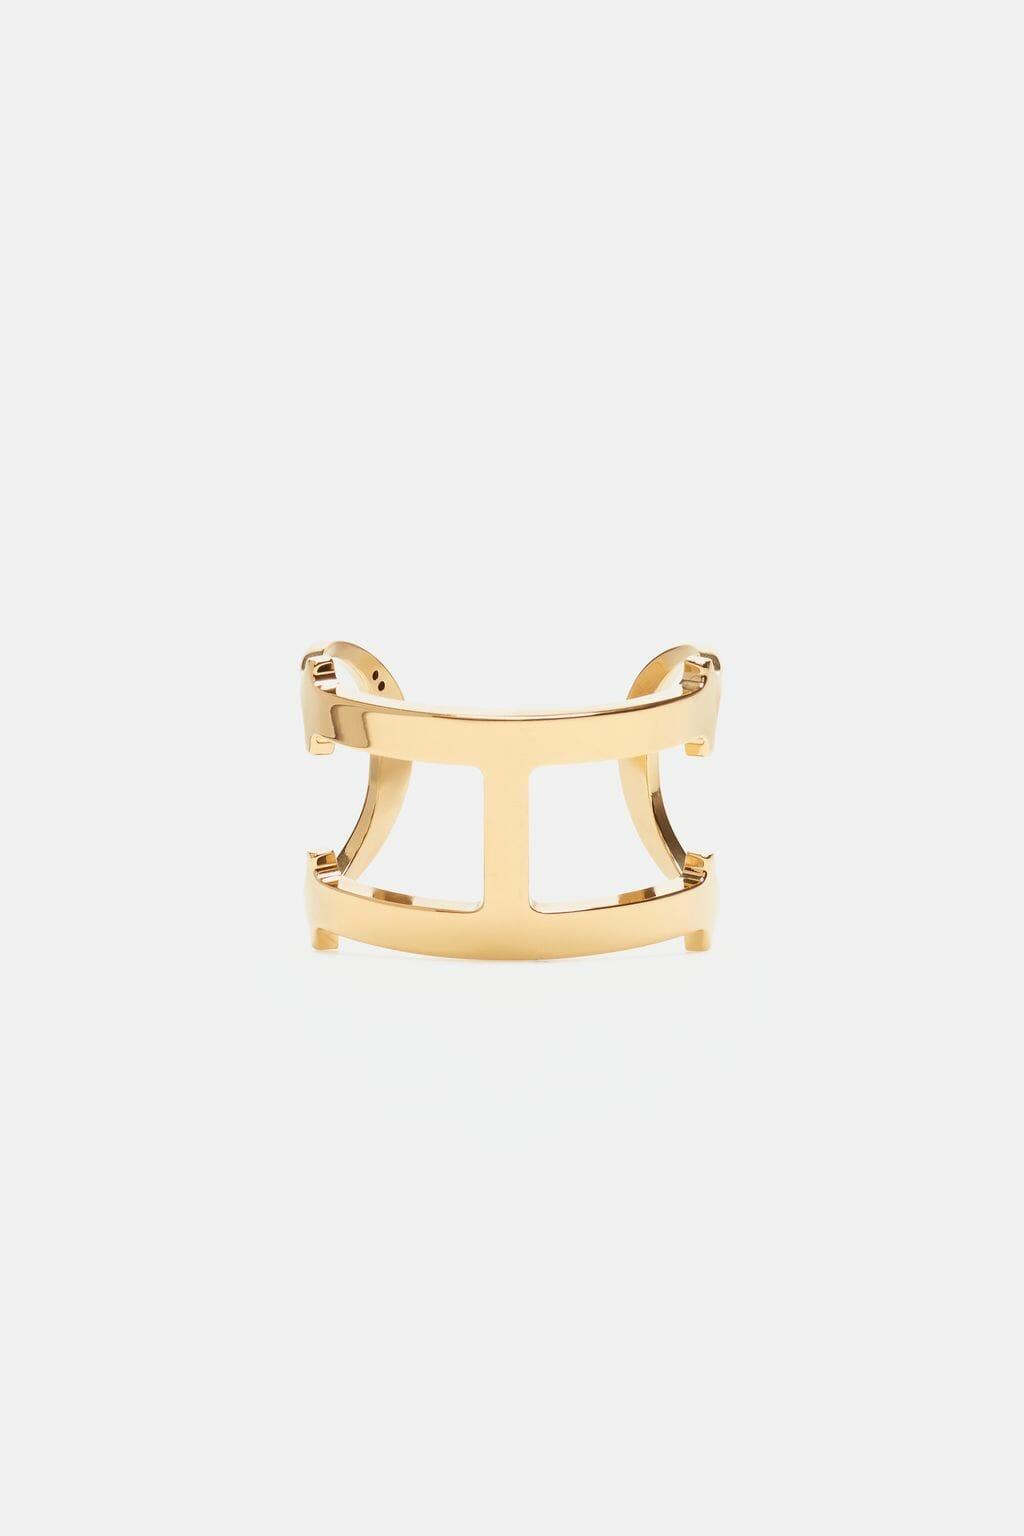 CH-Carolina-herrera-insignia-jewelry-look-4